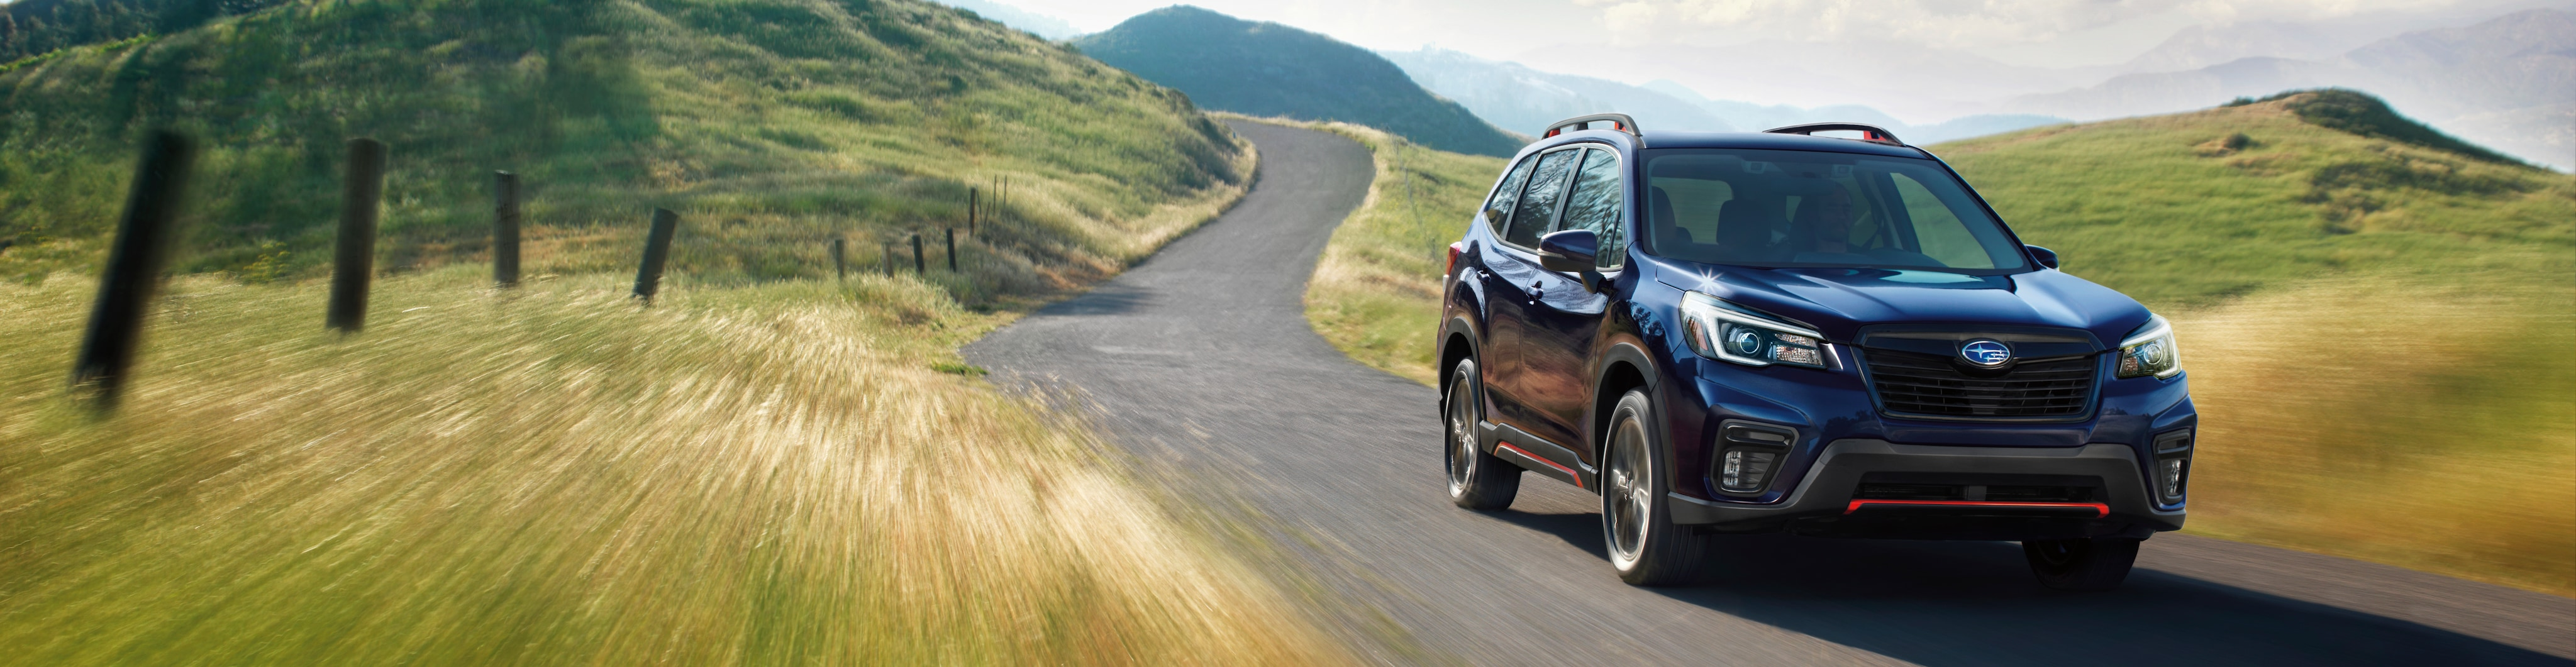 Subaru received Parents Best Family Car Awards